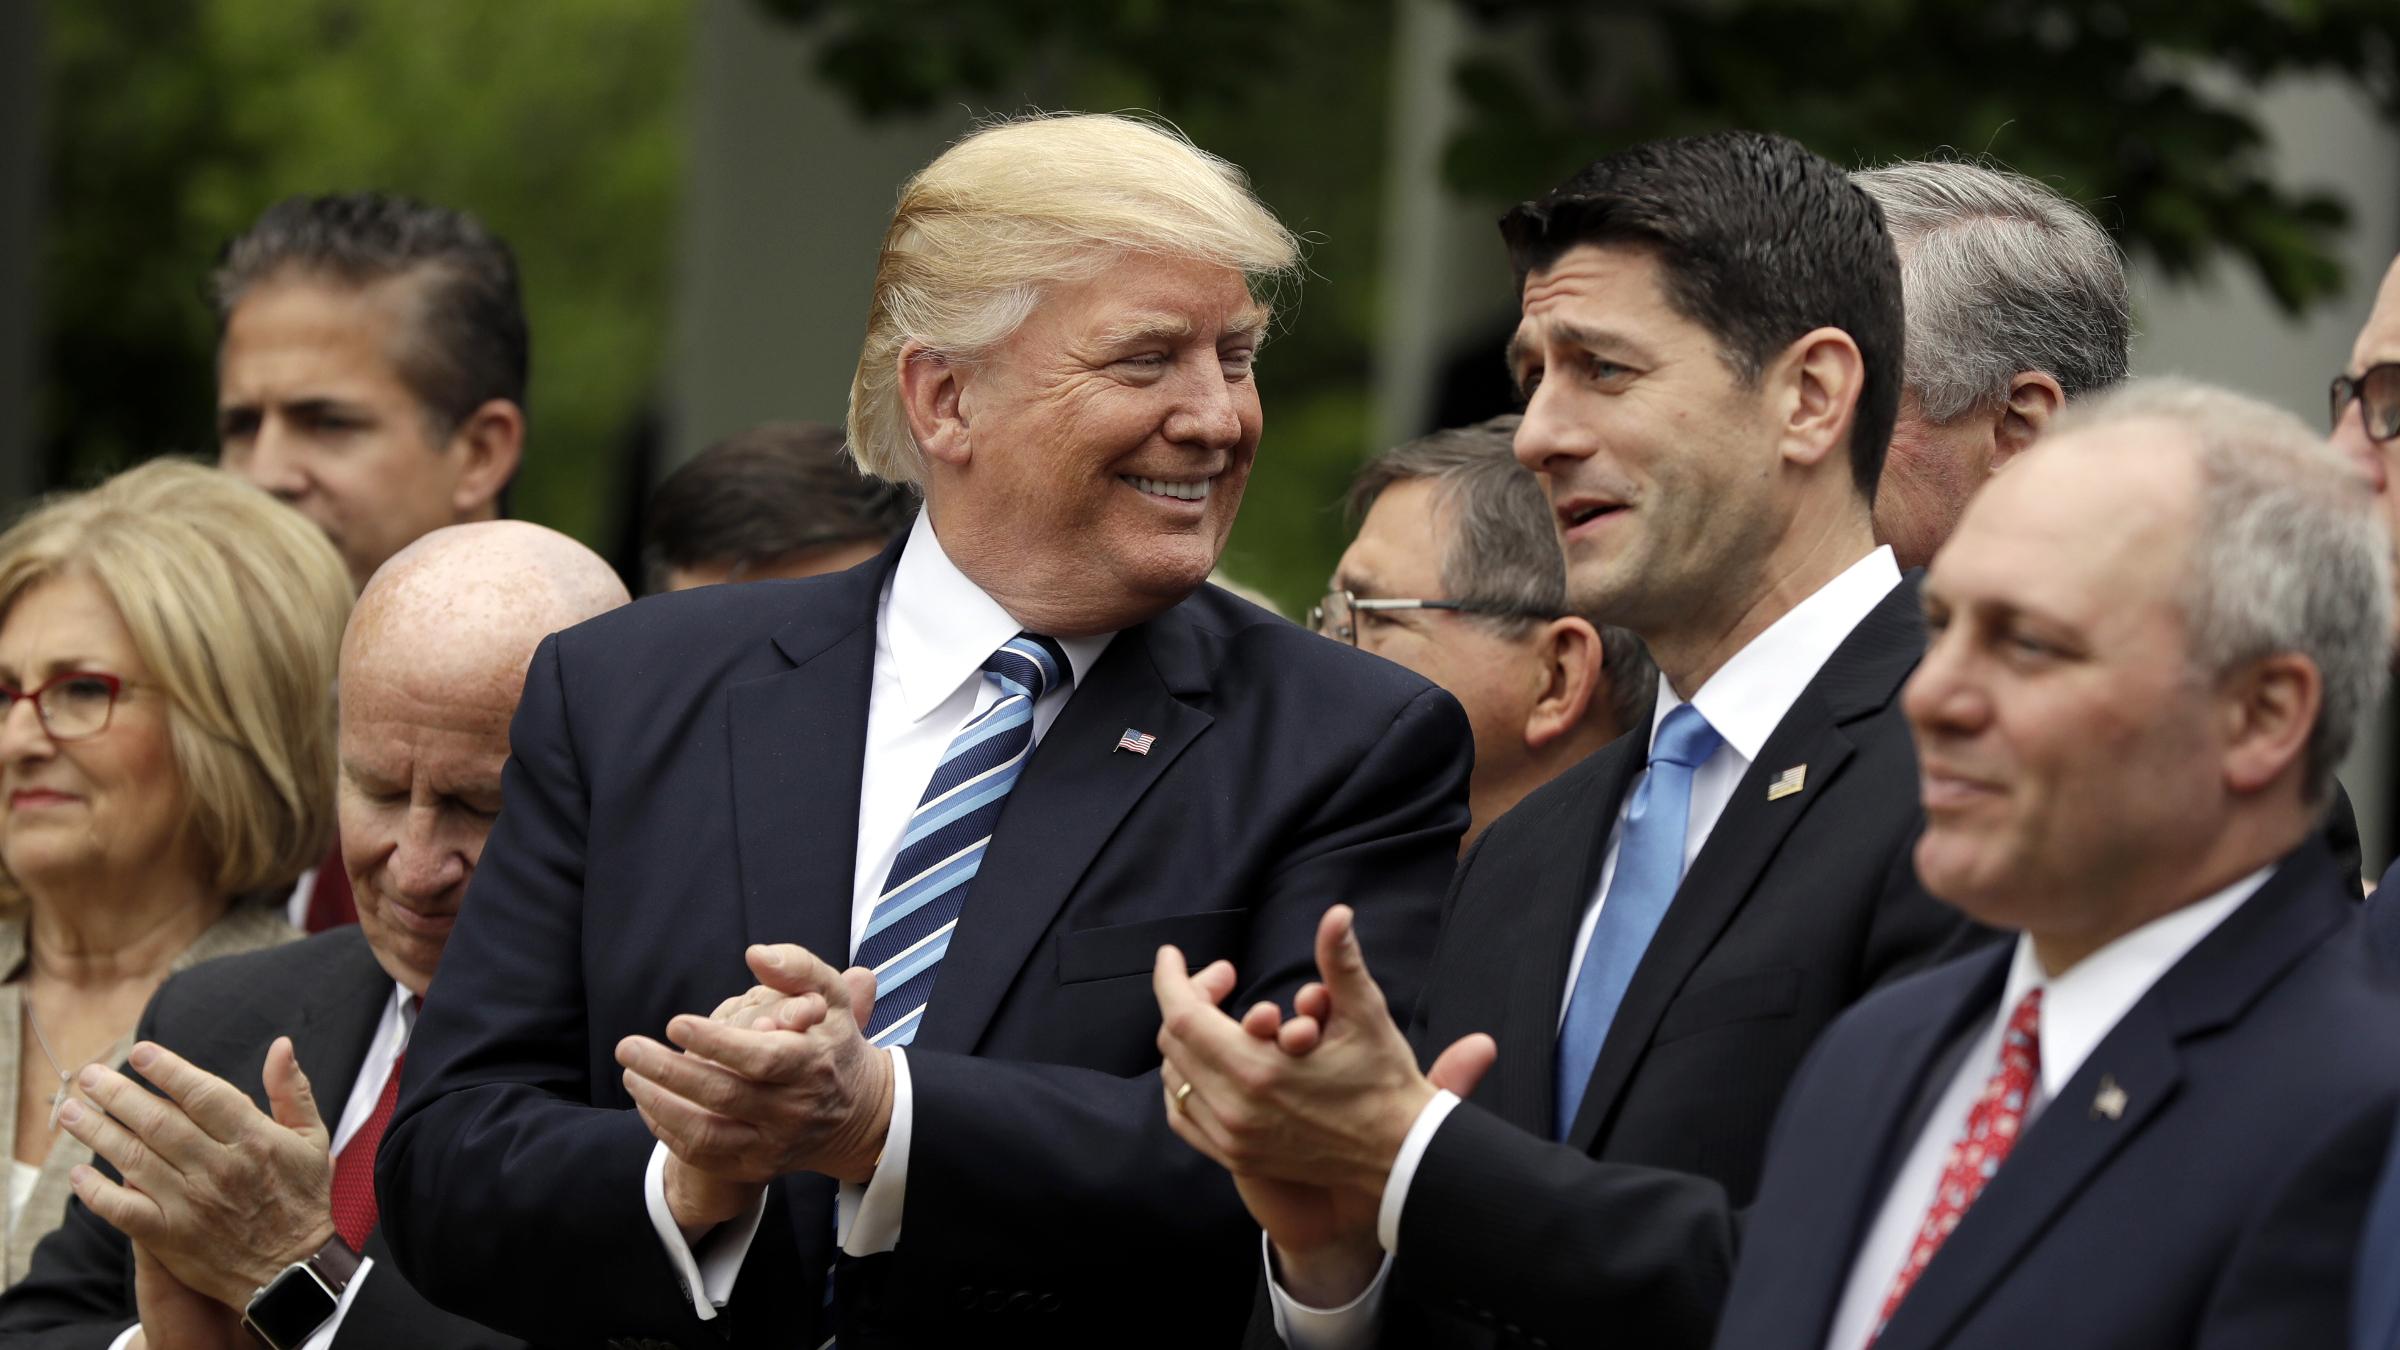 President Donald Trump speaks in the Rose Garden of the White House, Thursday, May 4, 2017, in Washington. (i)